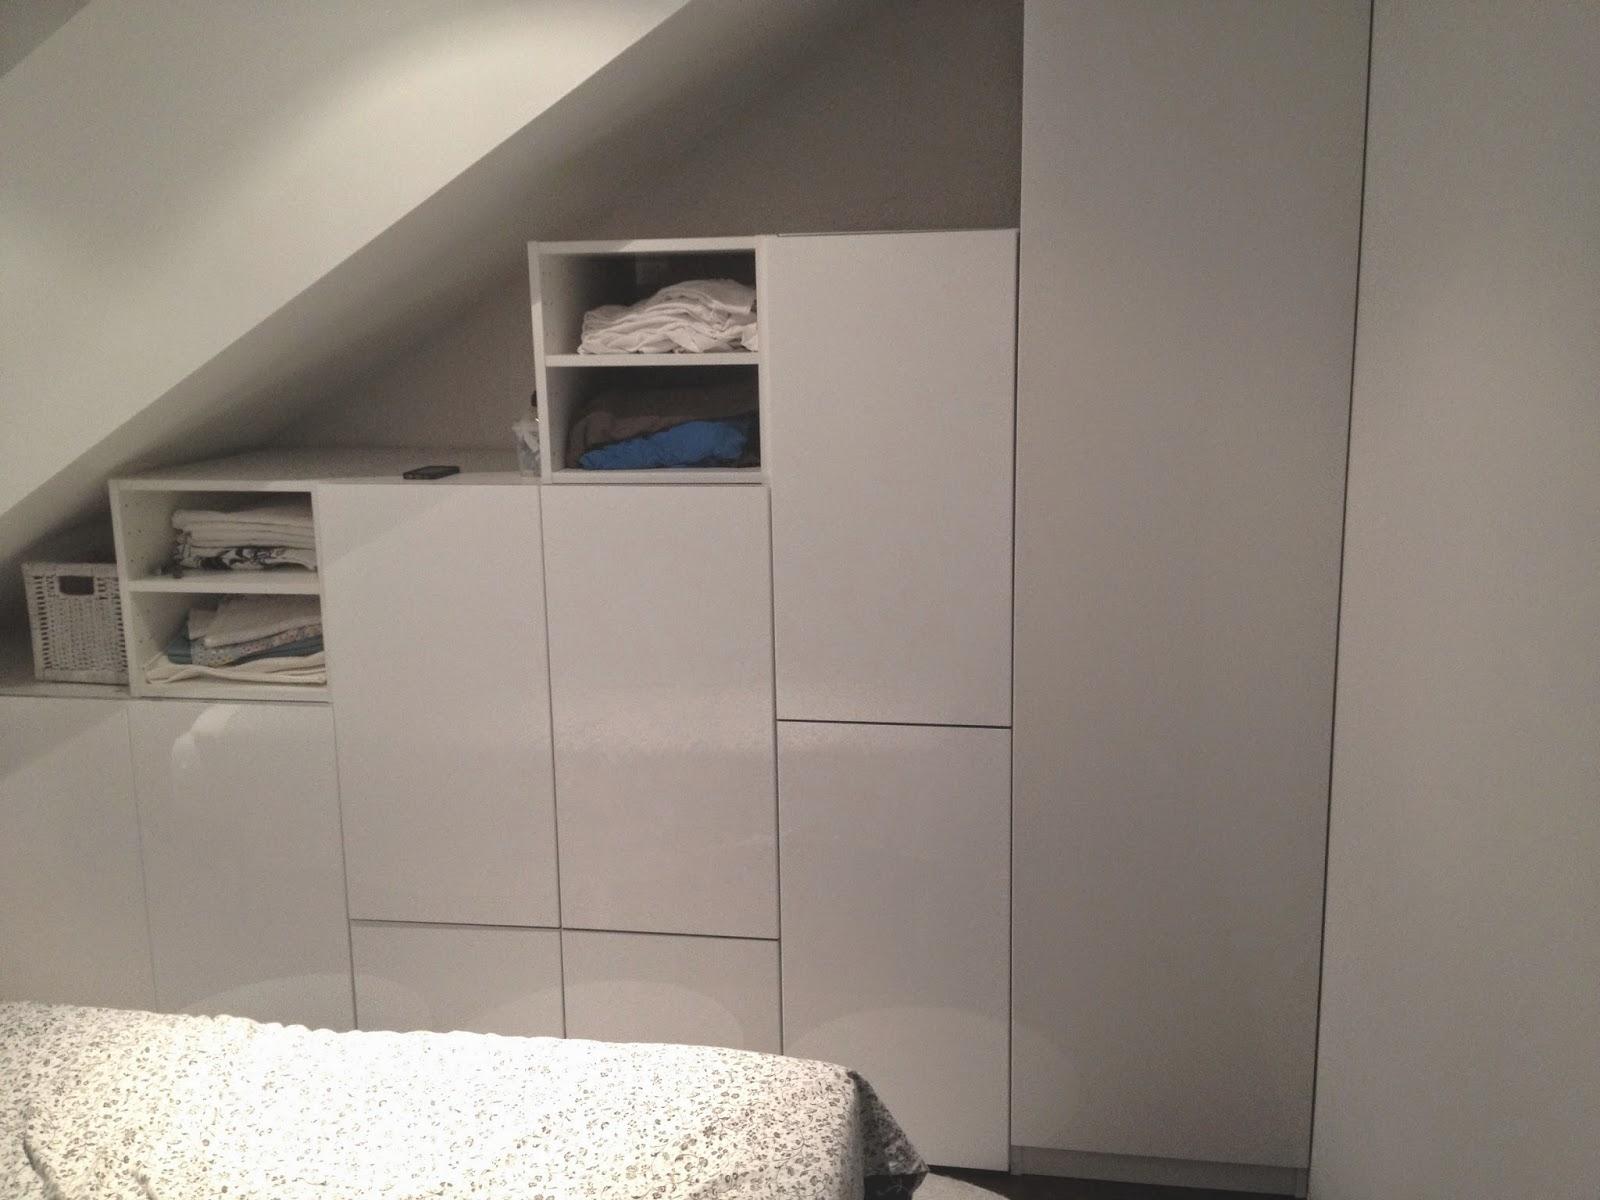 bygg garderob under snedtak | pyssel & inspiration